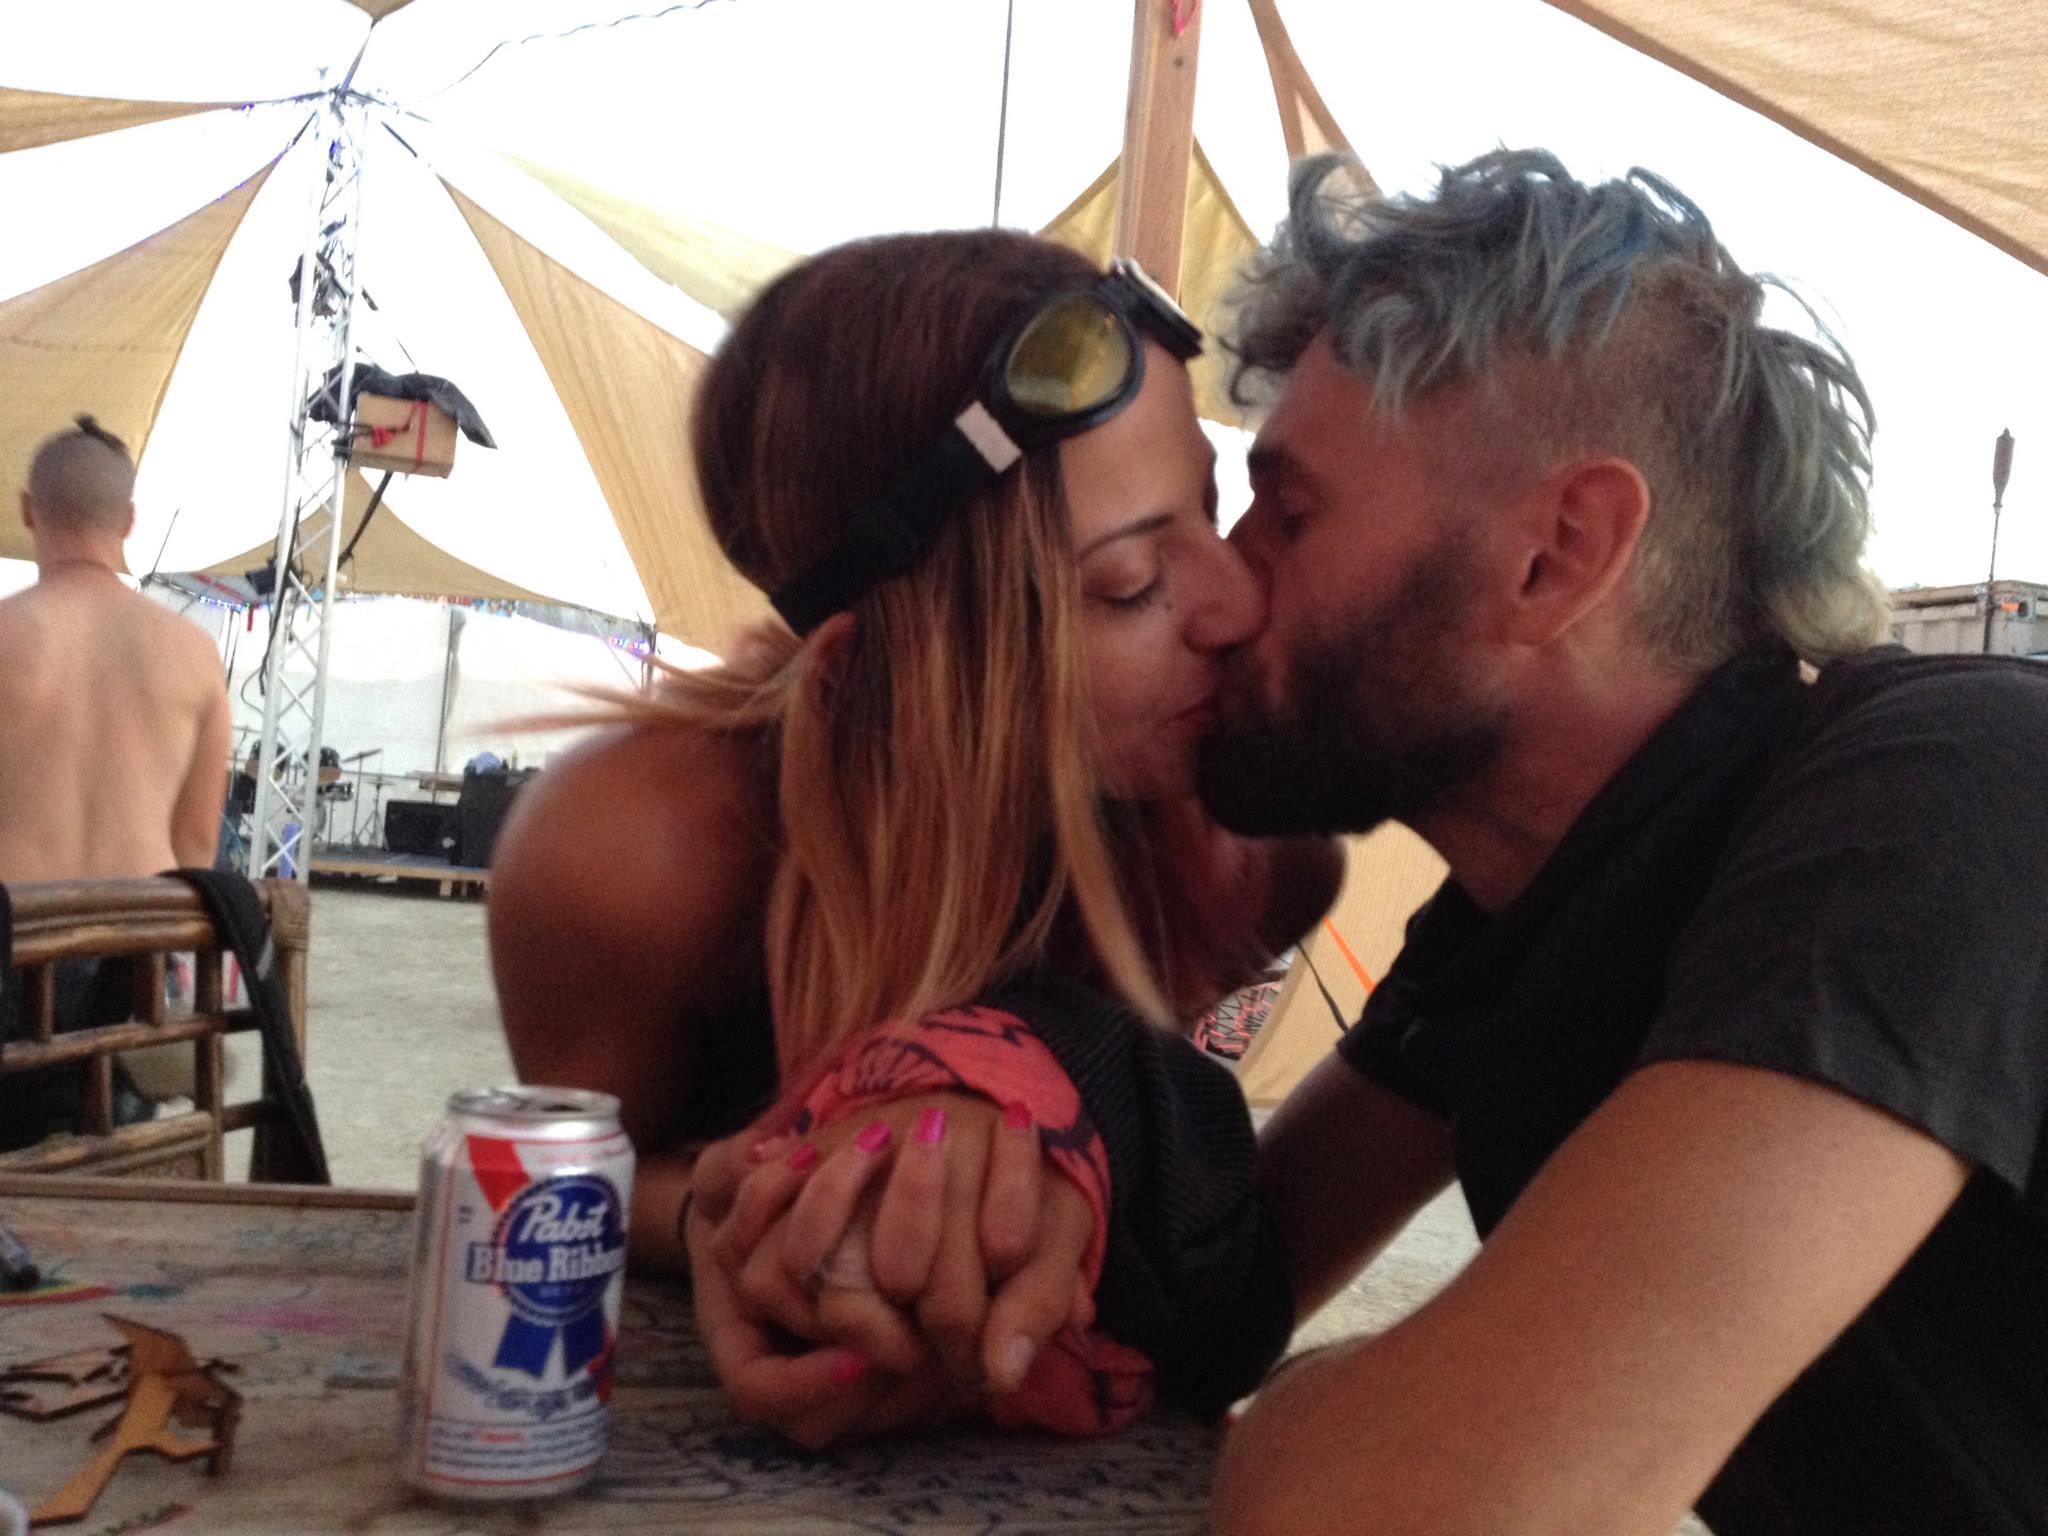 In love at Burning Man